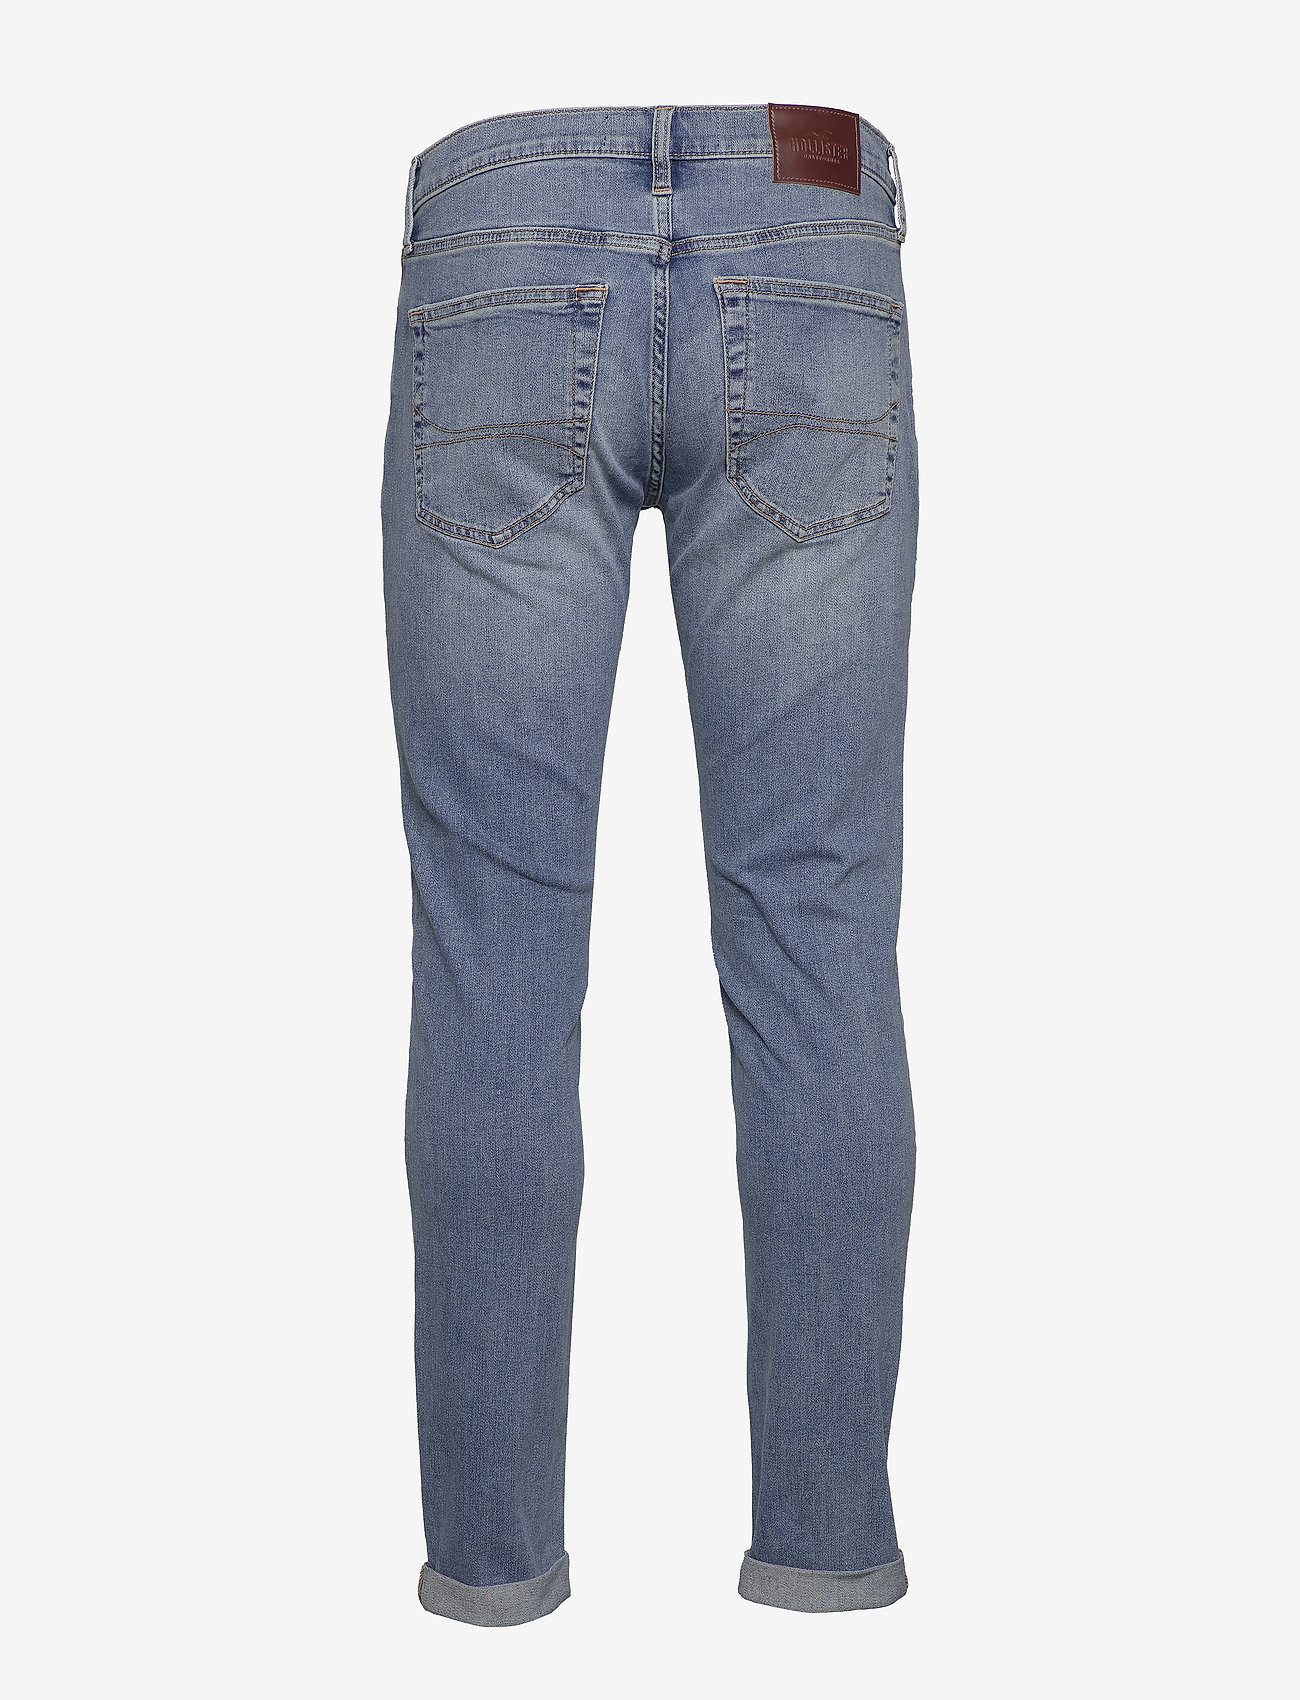 Jeans (Medium Destroy) (29.50 €) - Hollister YwJd5